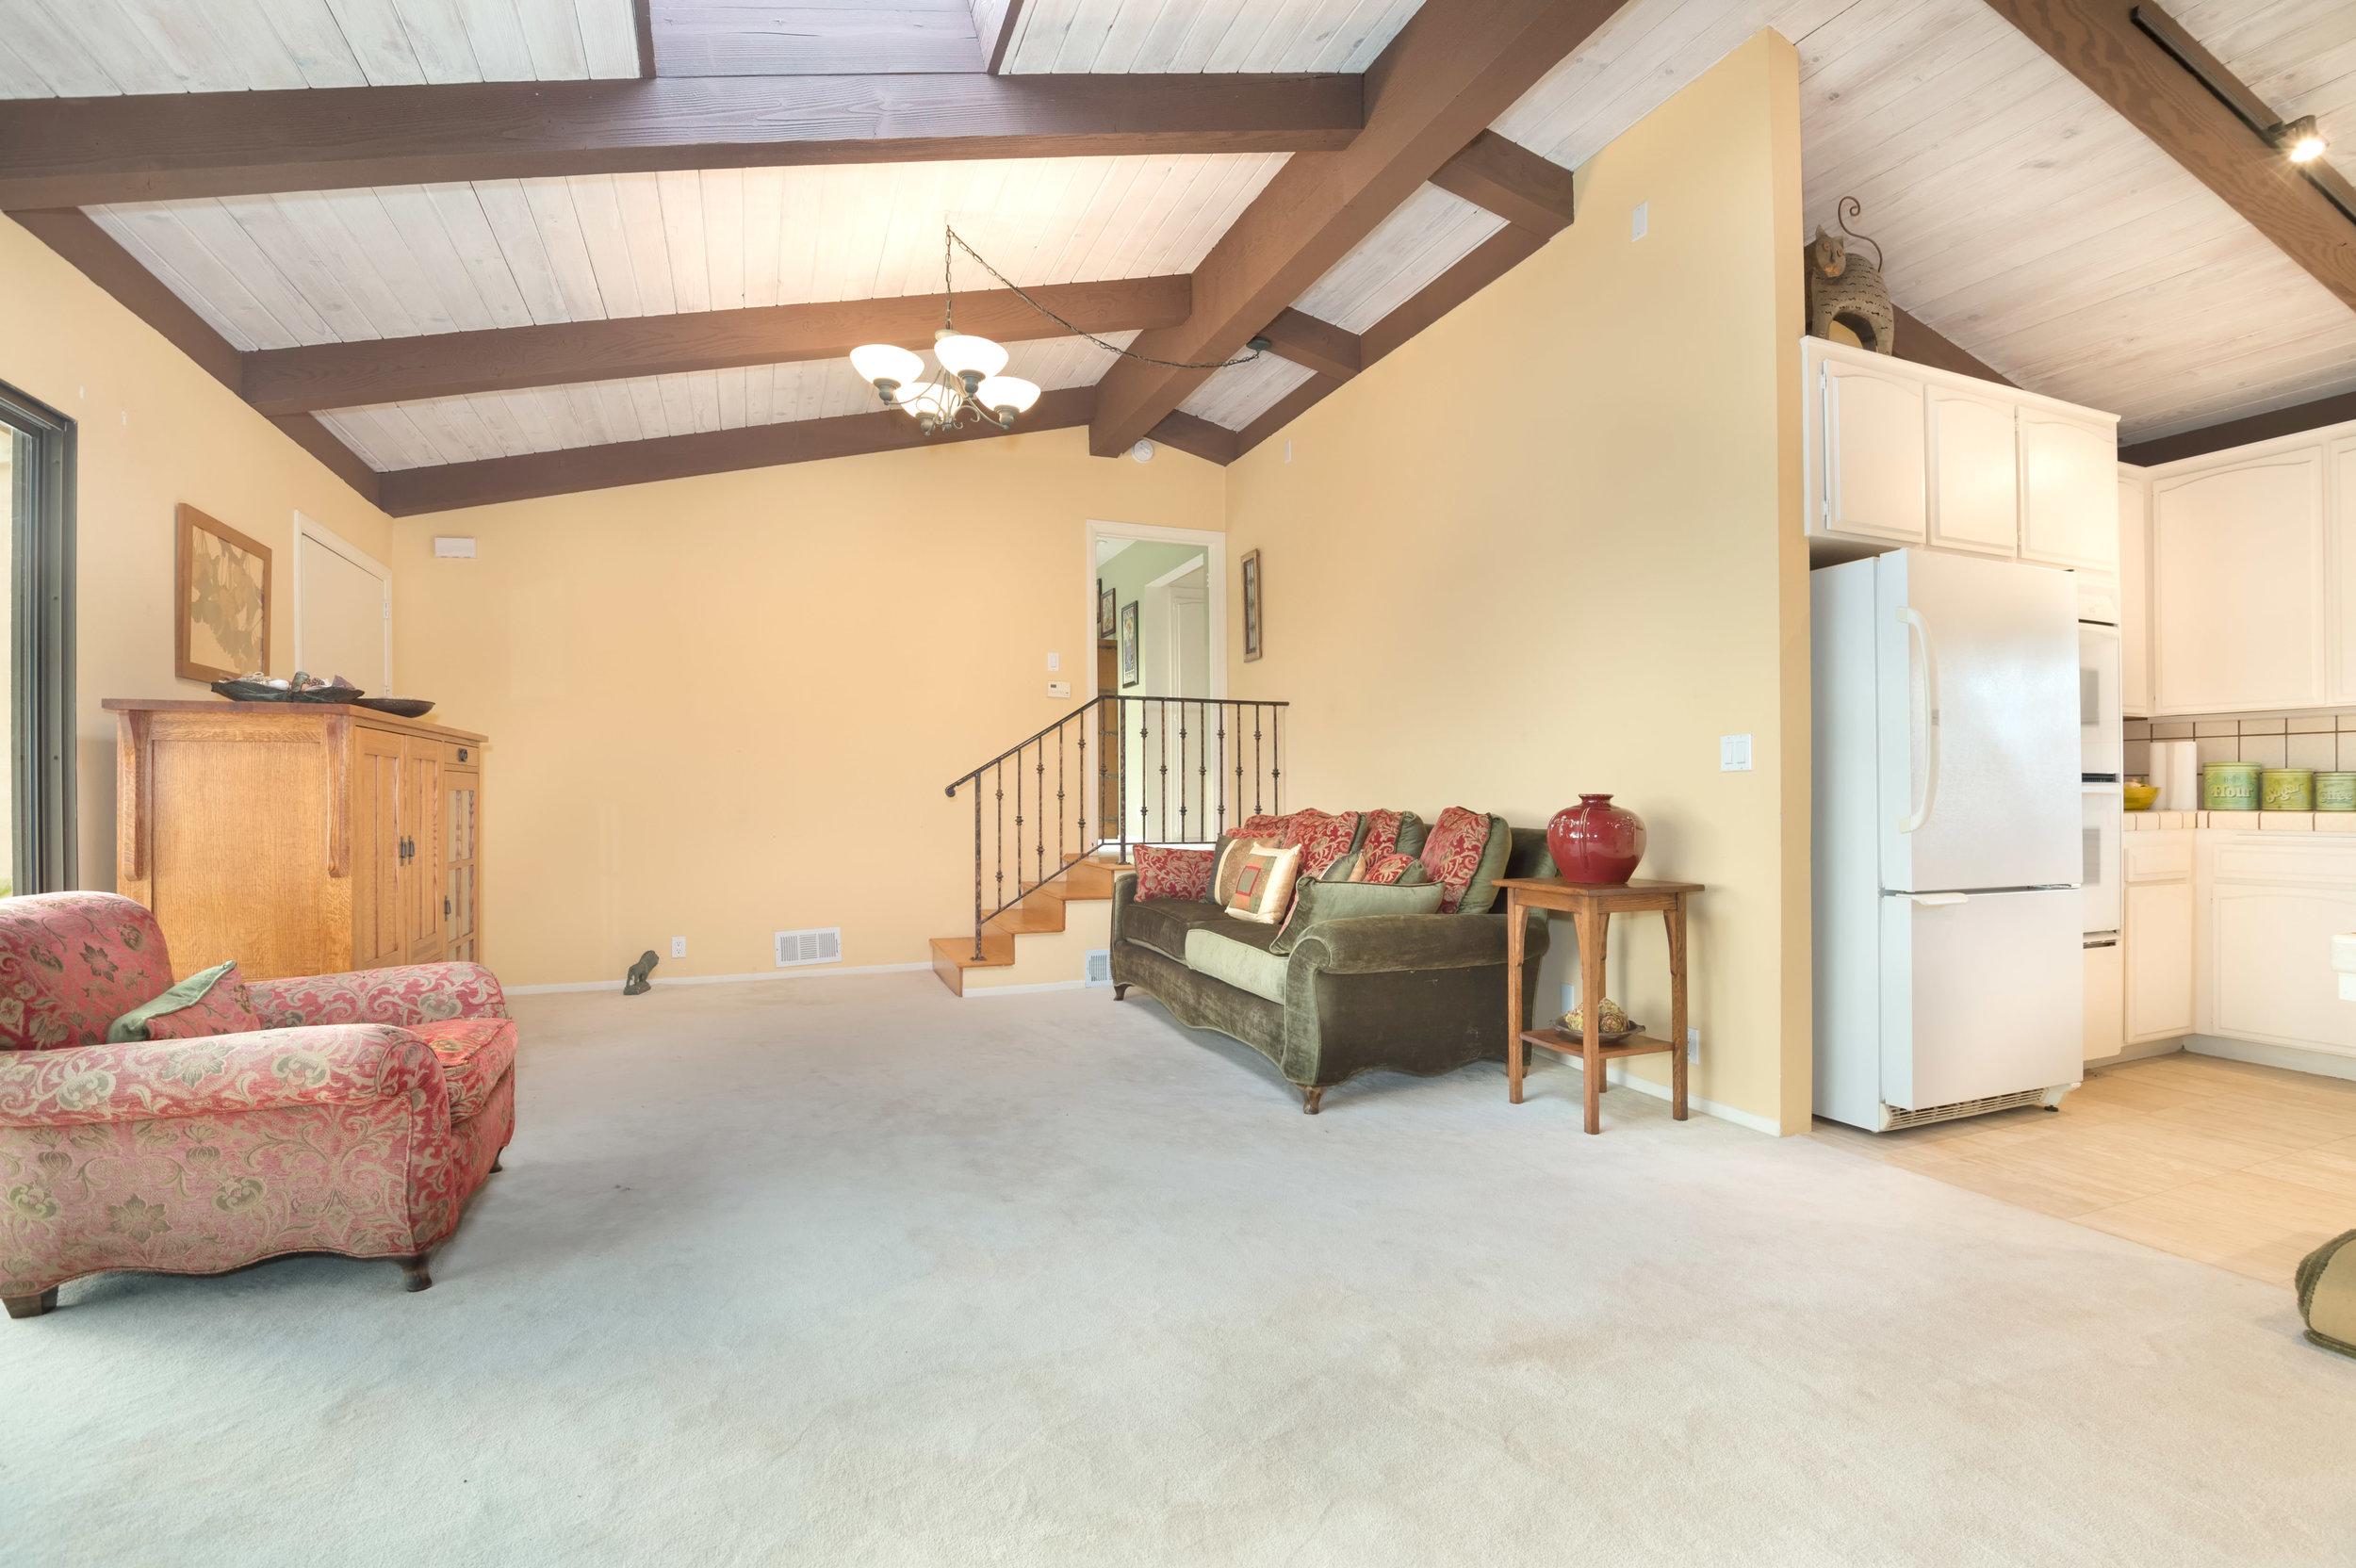 026 guest house  29660 Harvester Road Malibu For Sale The Malibu Life Team Luxury Real Estate.jpg